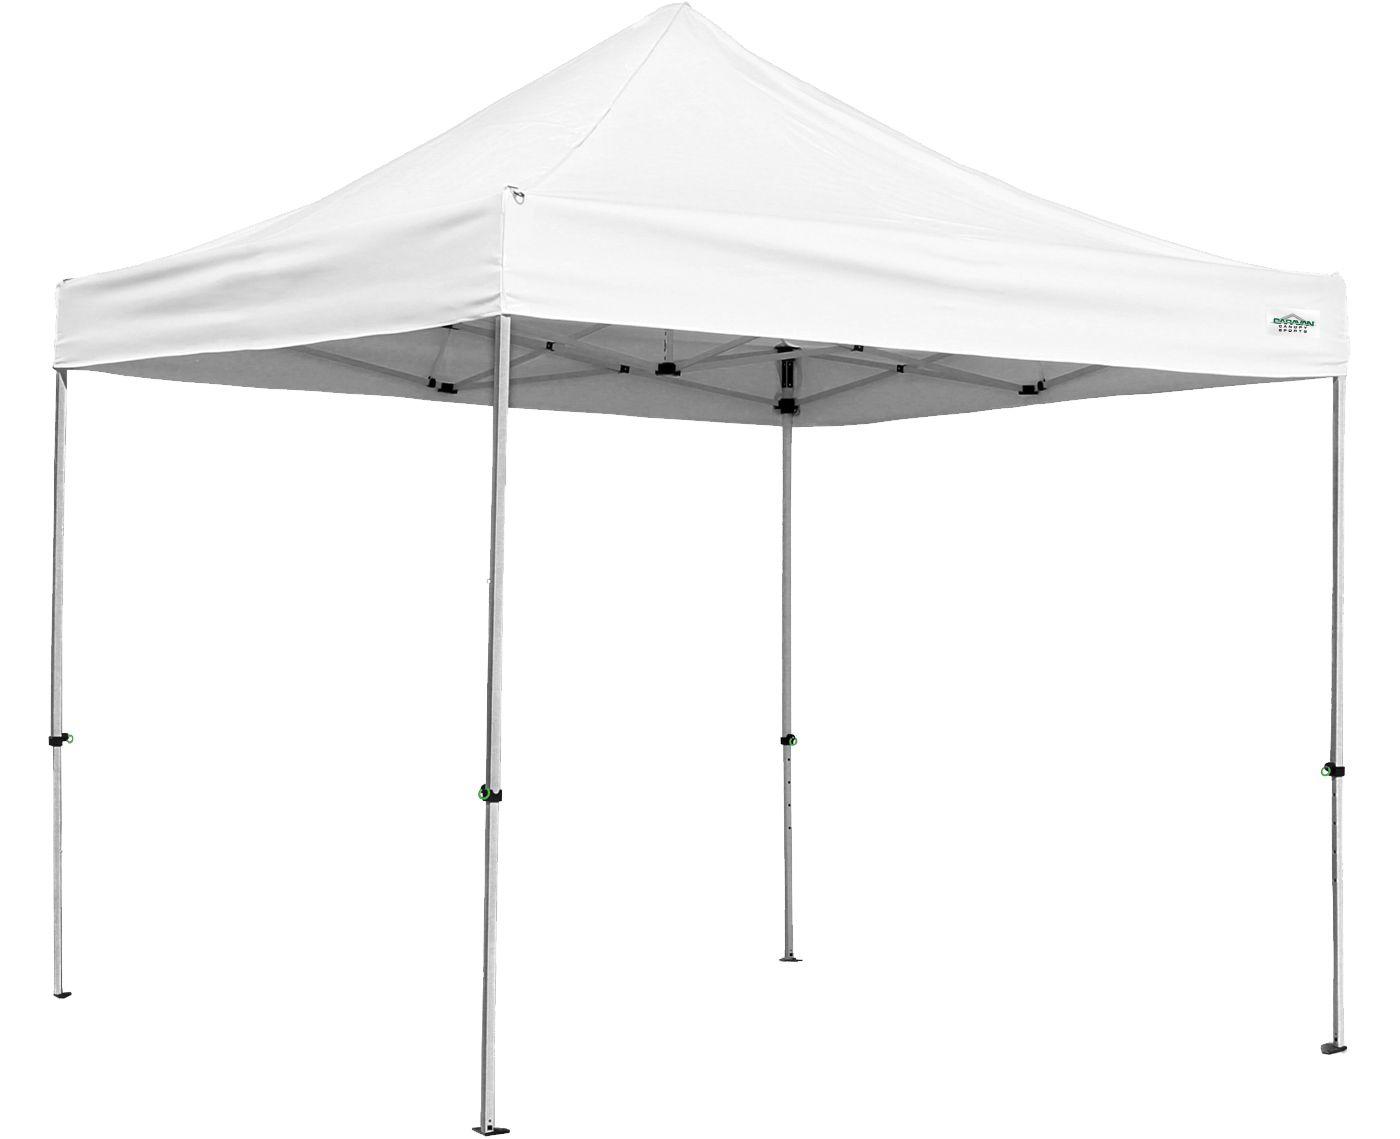 Caravan Canopy 10' x 10' AlumaShade Deluxe Canopy